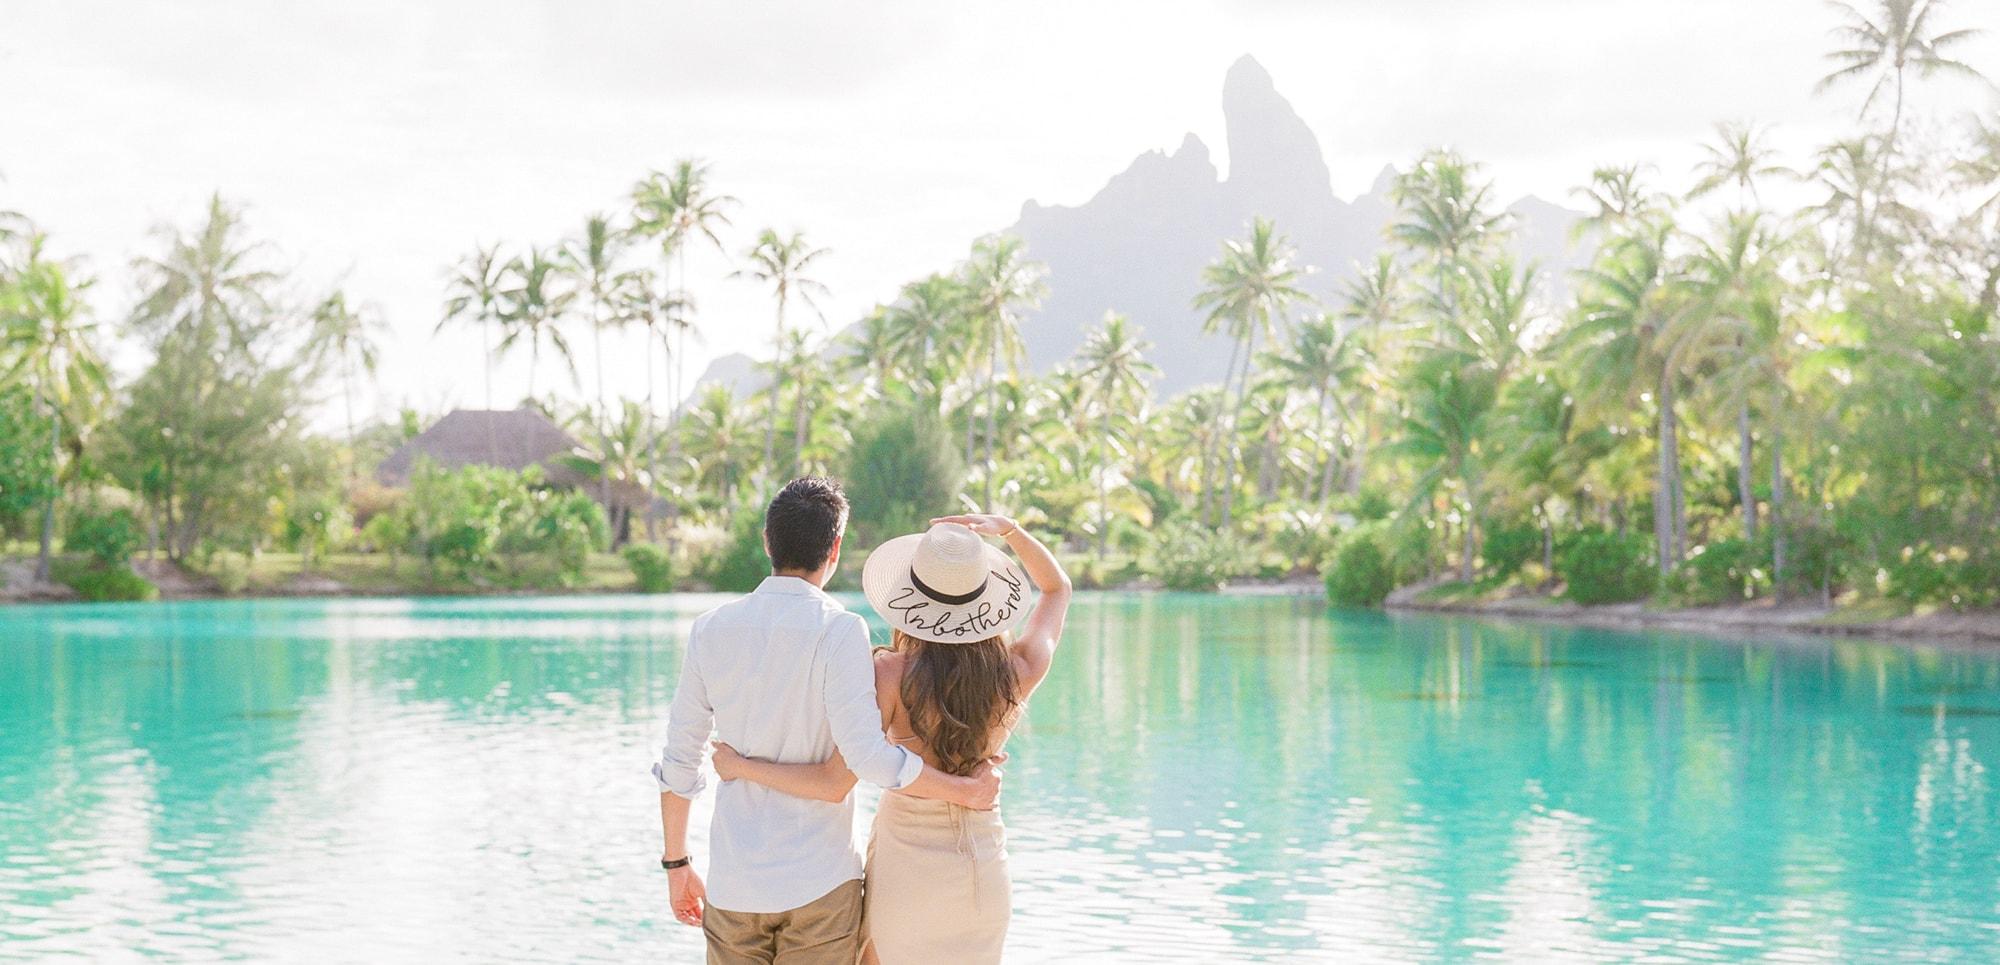 https://tahititourisme.com.br/wp-content/uploads/2021/04/PCP-Bora-Bora-Photographer-St-Regis-Honeymoon.jpg